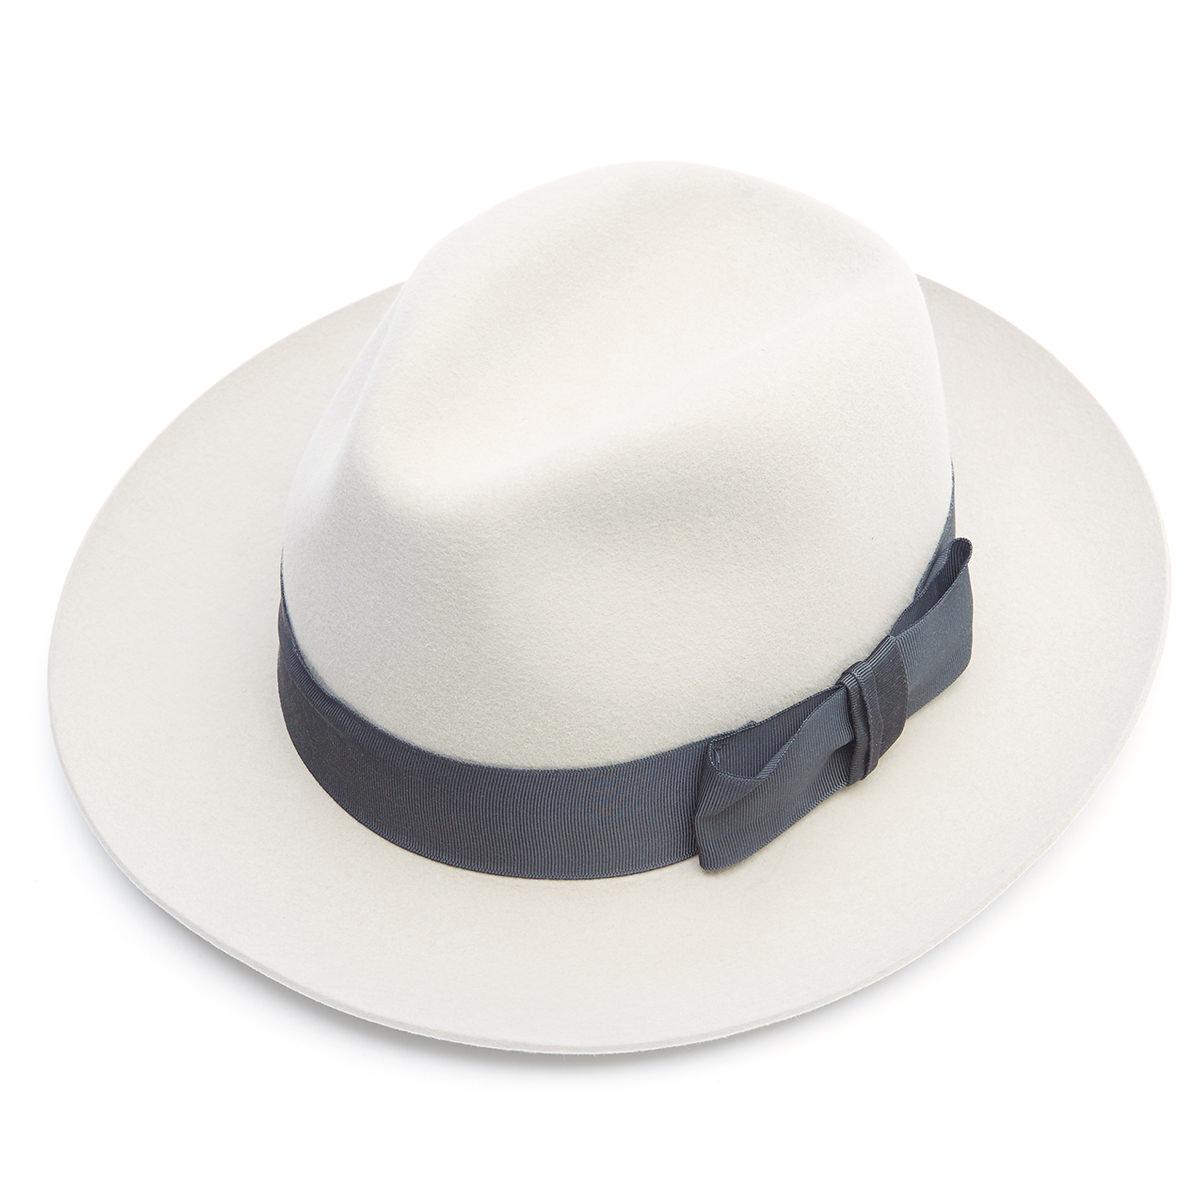 Knightsbridge Fur Felt Fedora Hat - BEIGE - size 62